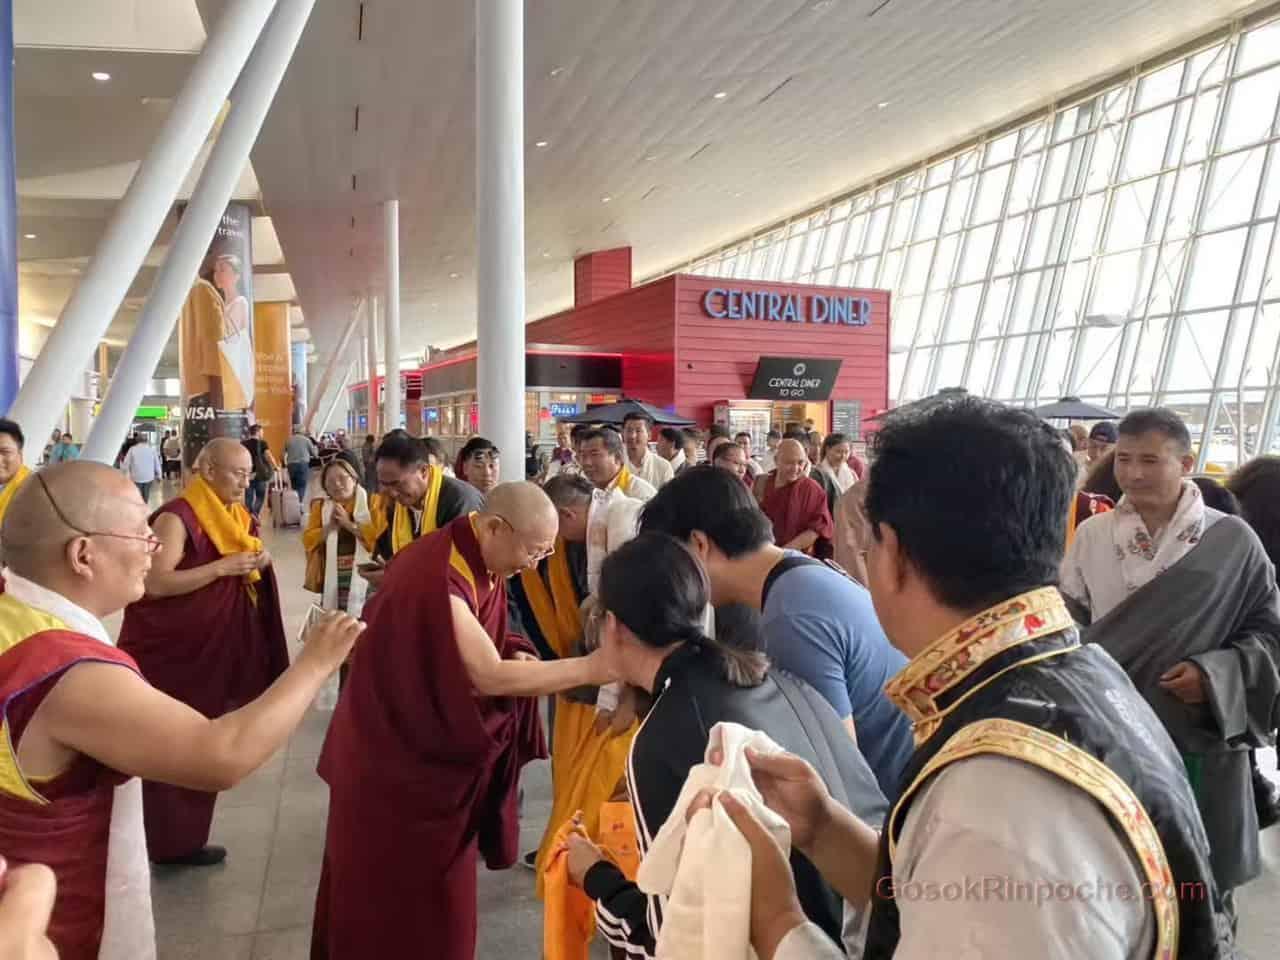 Gosok Rinpoche NYC airport 20190926184814